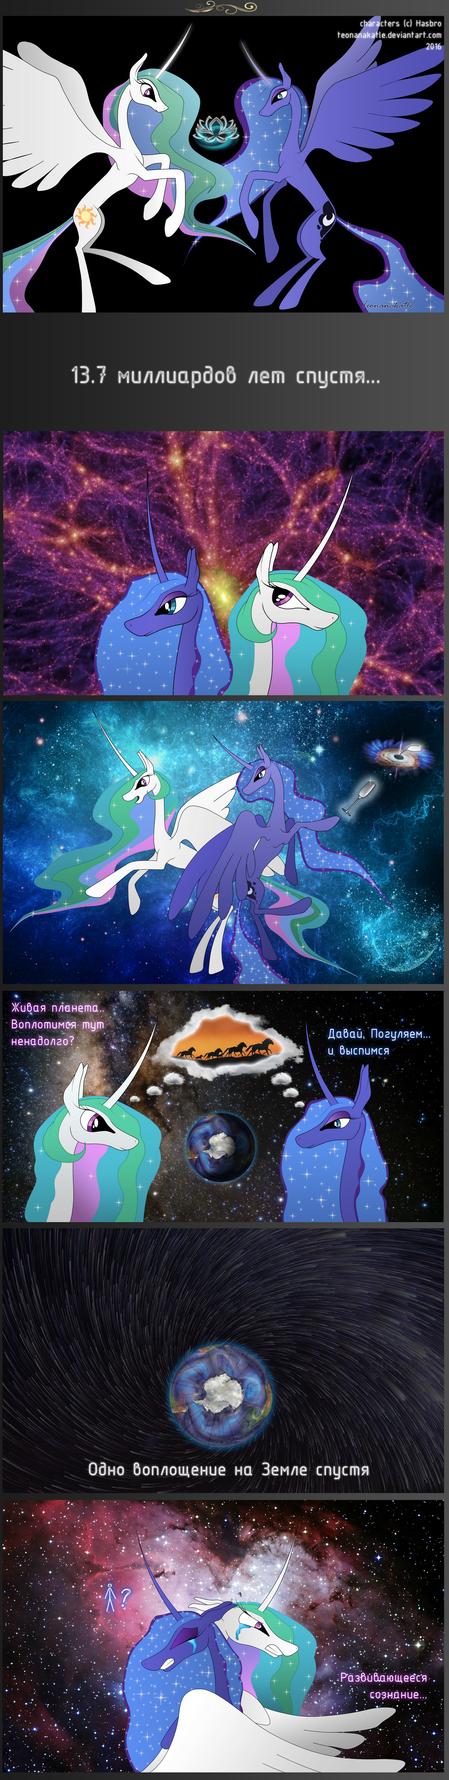 Space trip of Tia and Lulu [RU] by Teonanakatle